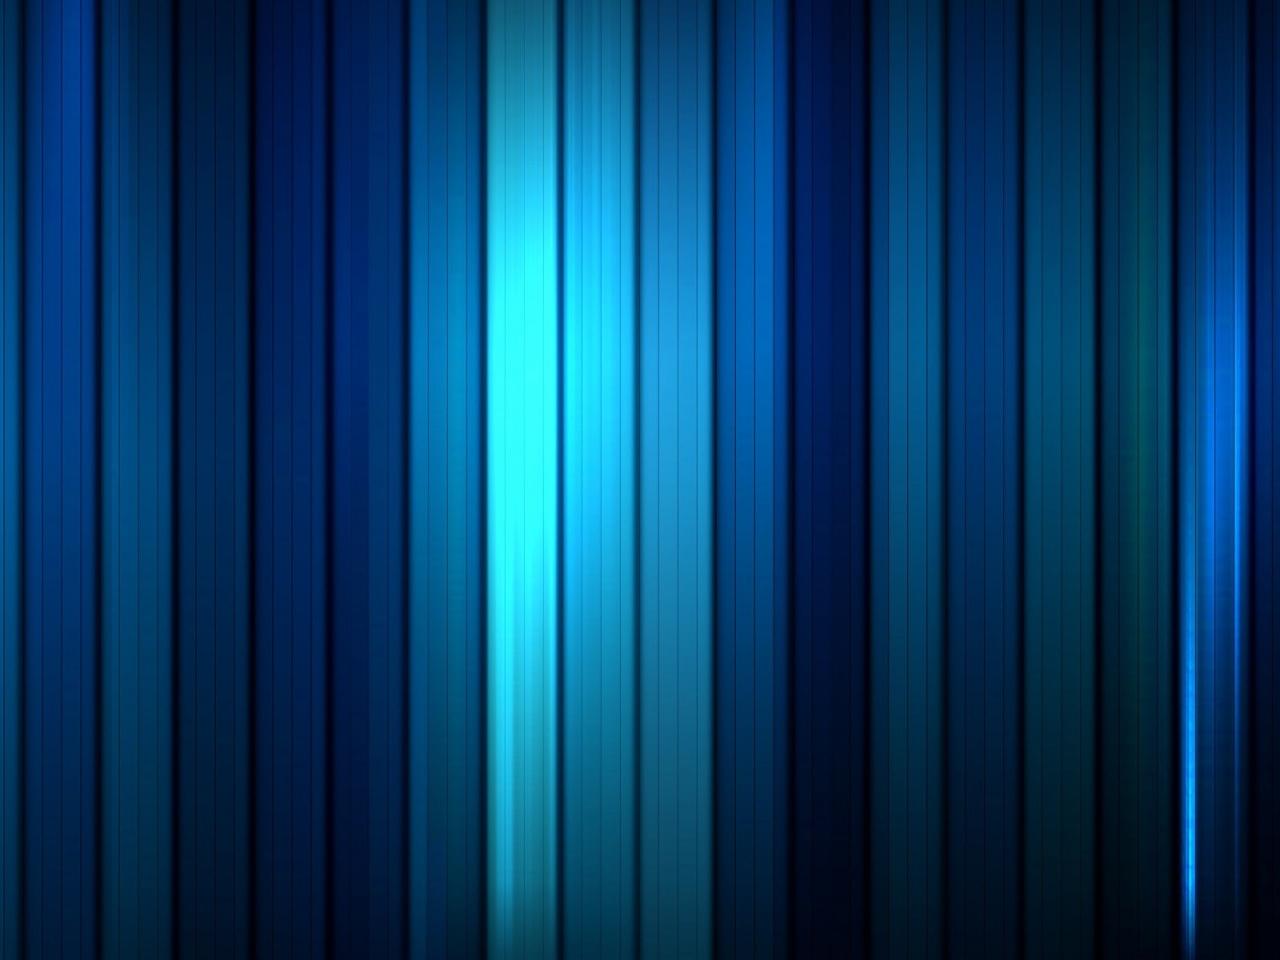 art hd Stripes Wallpapers